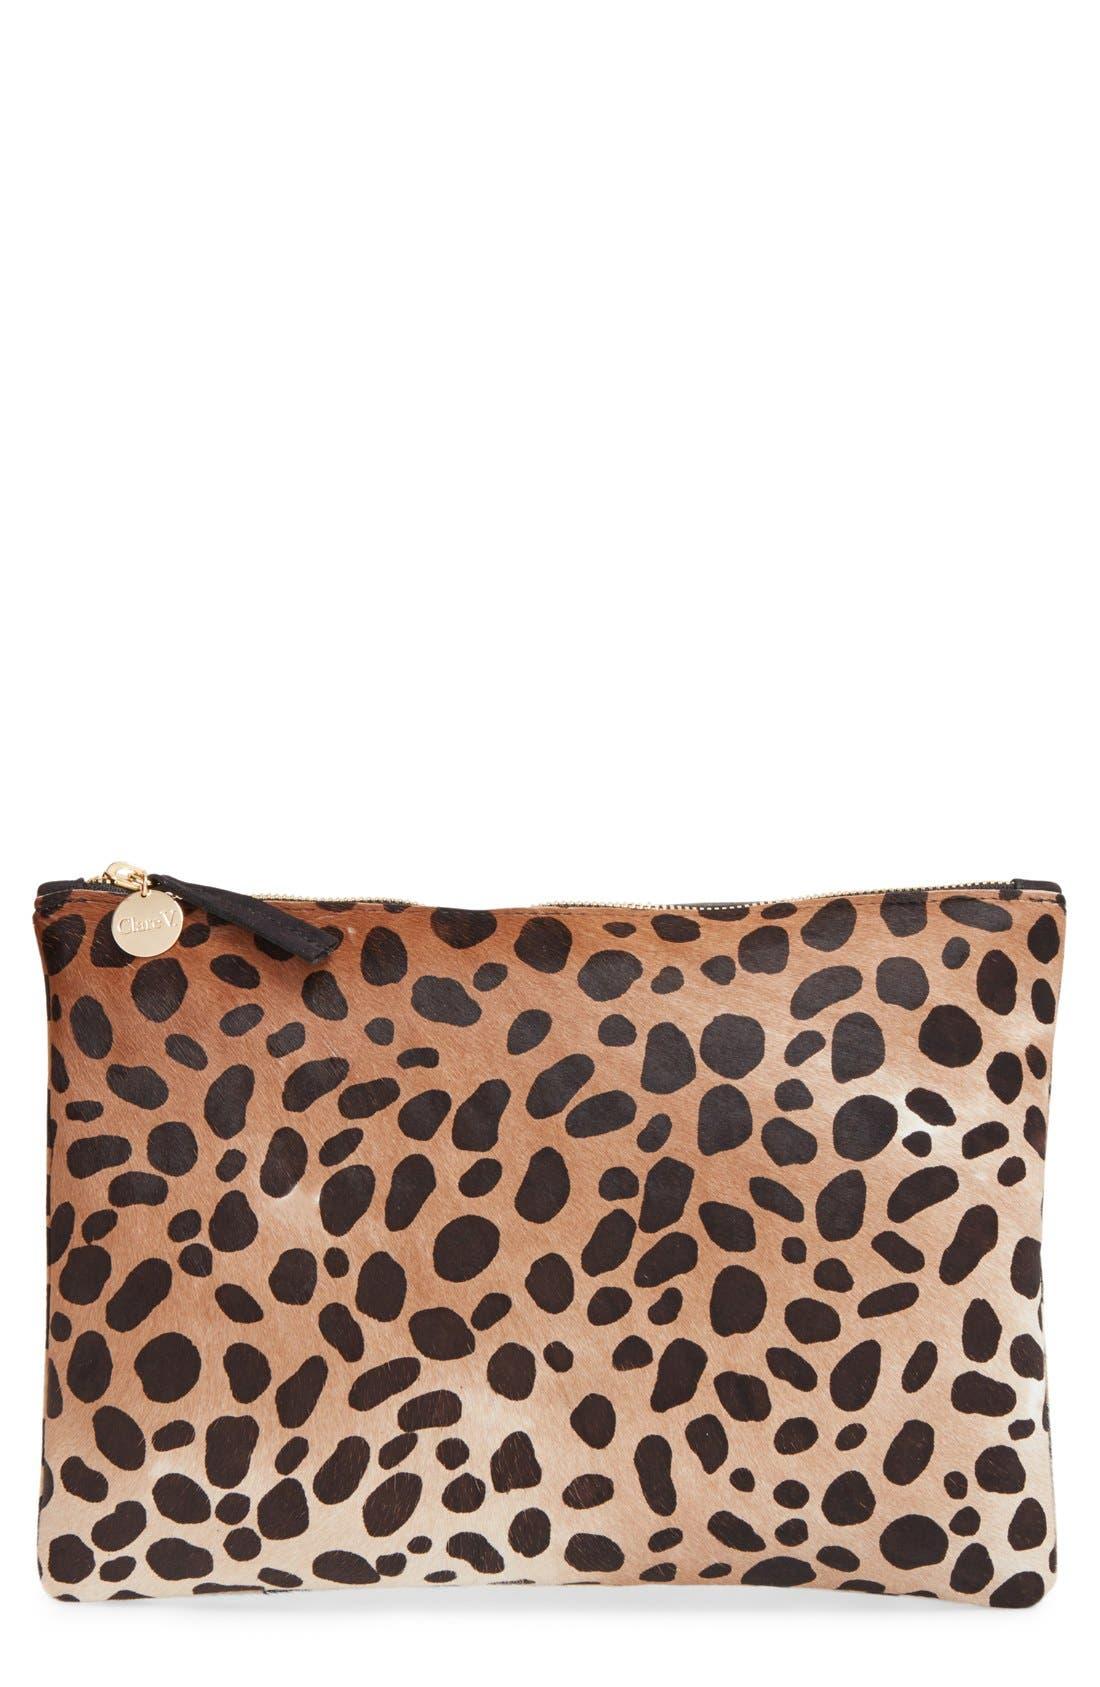 Alternate Image 1 Selected - Clare V. Genuine Calf Hair Leopard Print Zip Clutch